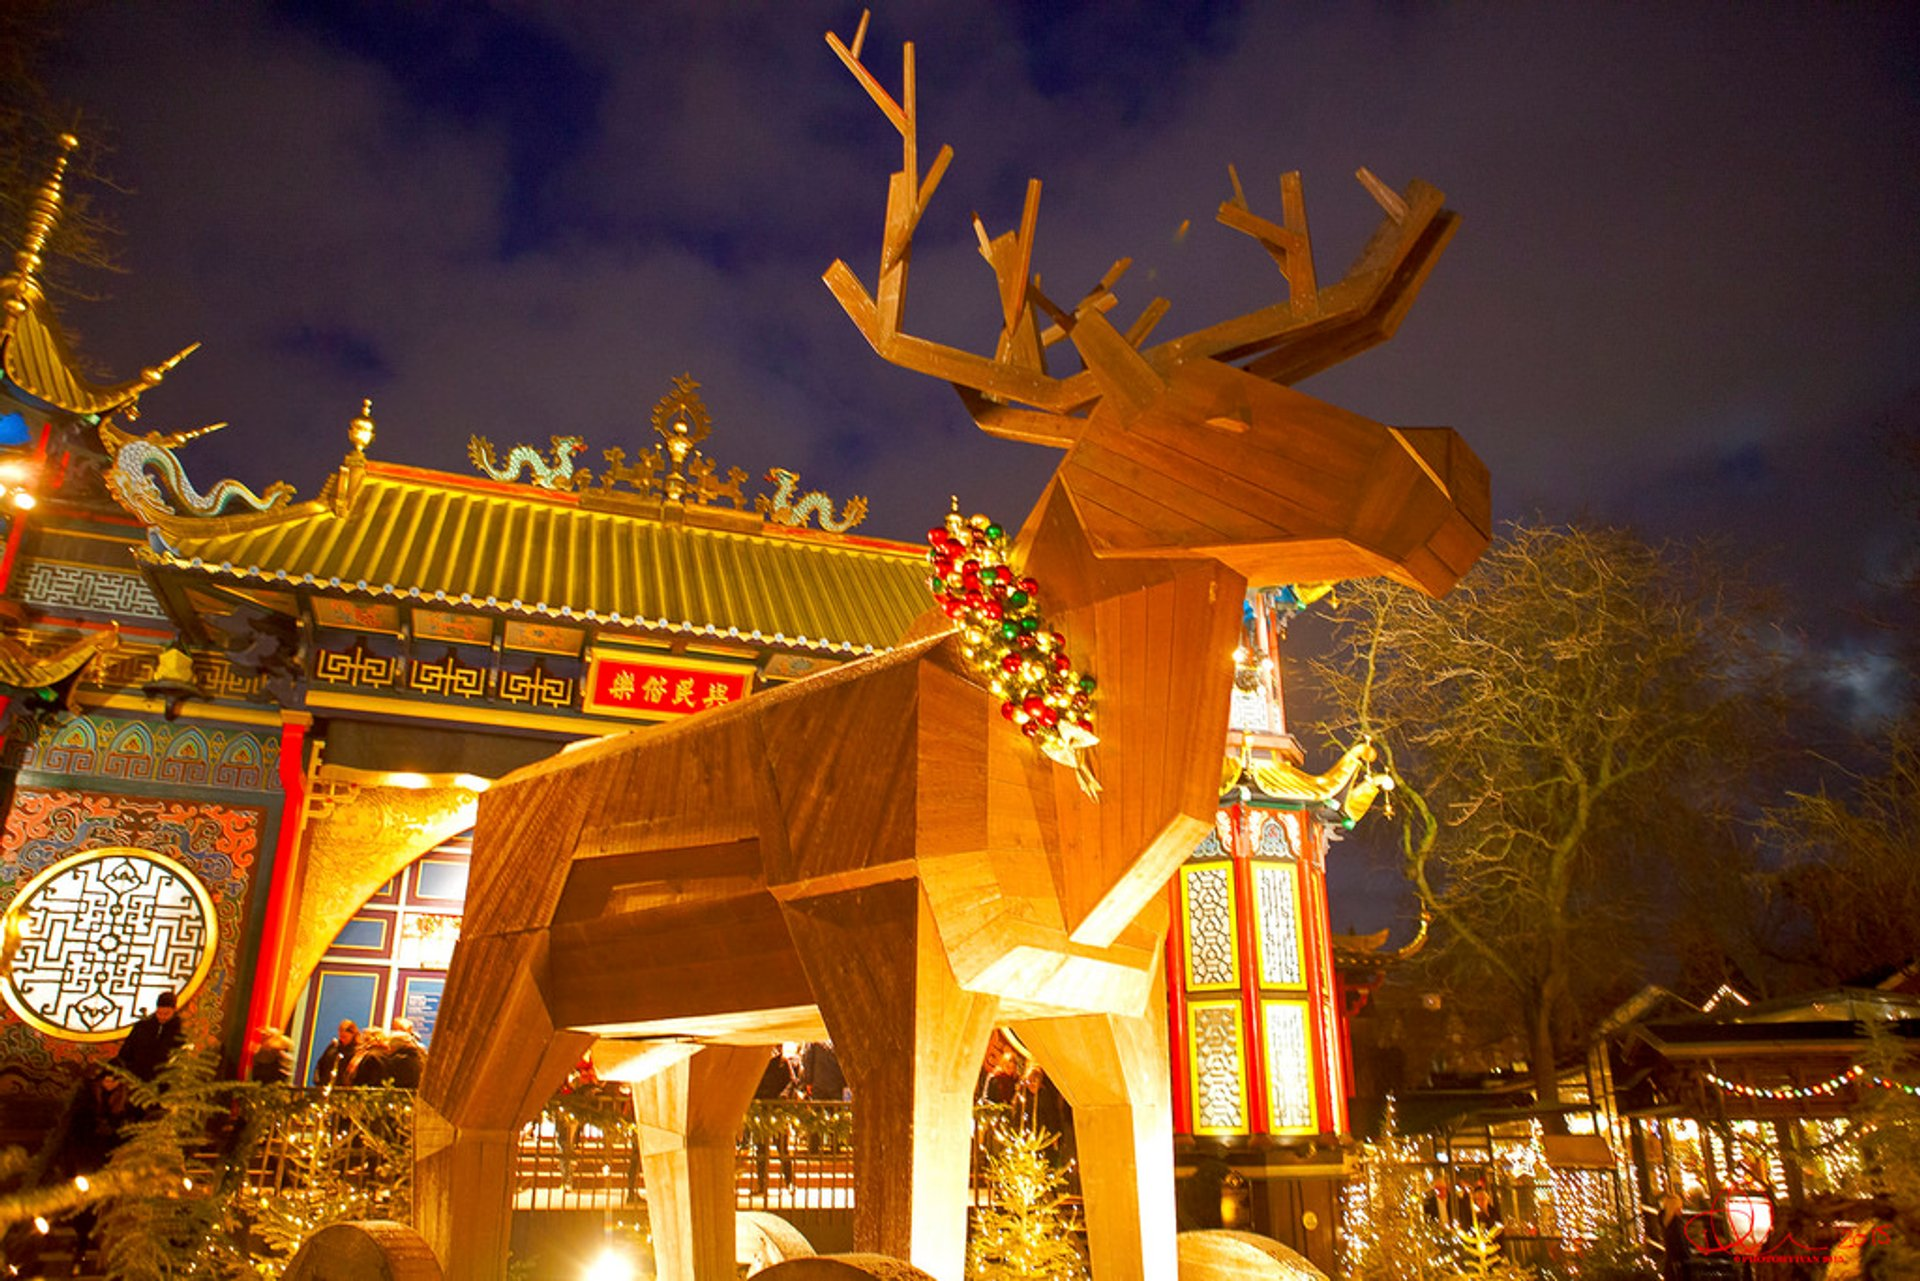 Trojan reindeer in the Tivoli Gardens 2019